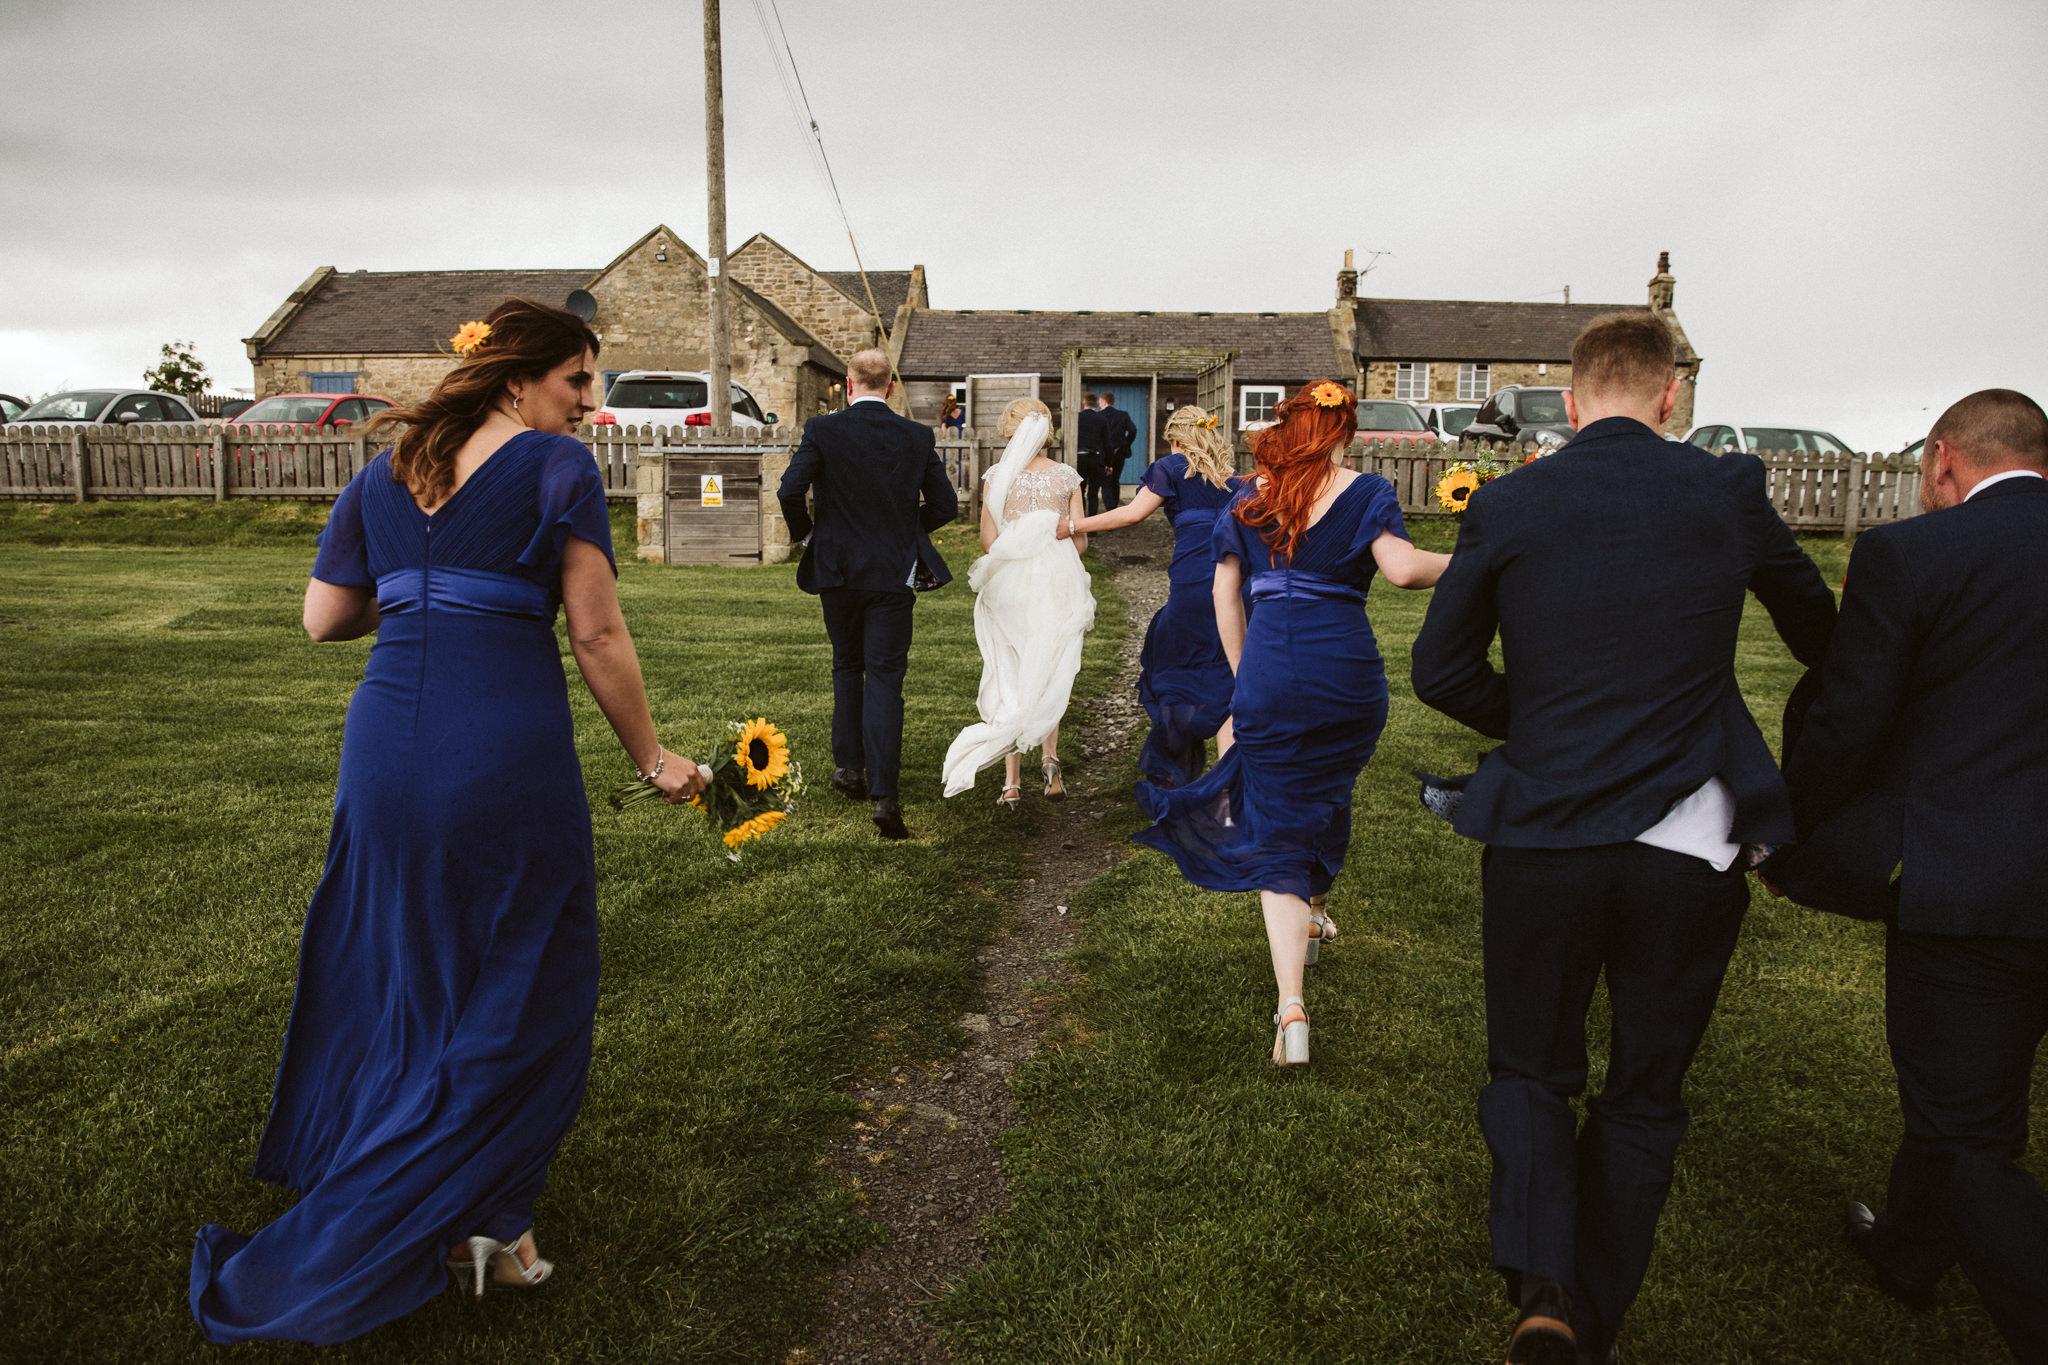 northside-farm-wedding-northumberland-margarita-hope (97).jpg